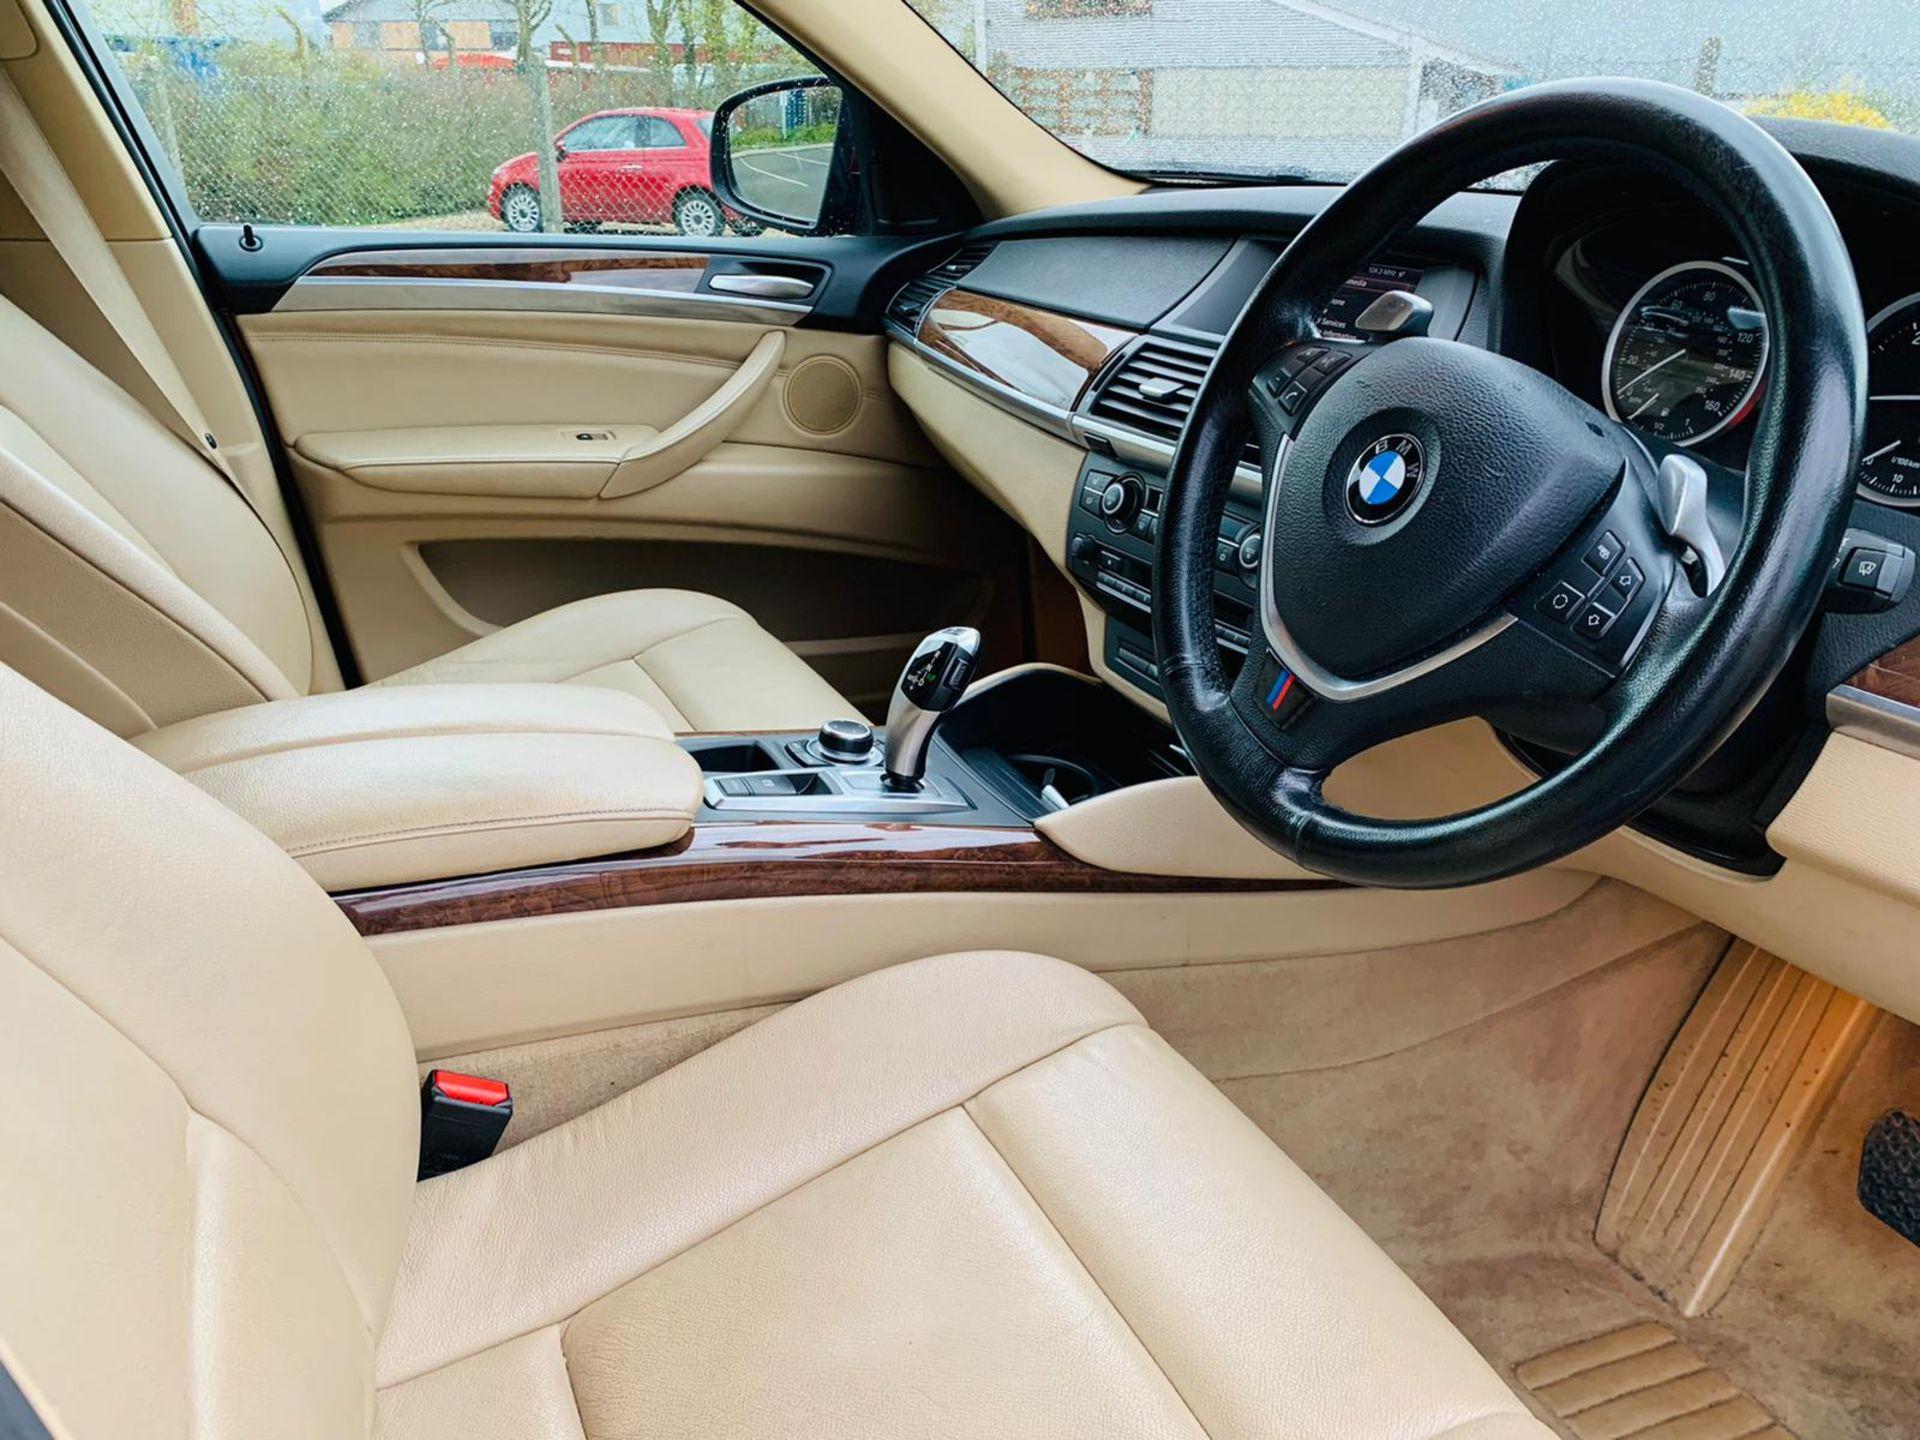 Reseve Met - BMW X6 xDrive 3.0d Auto - 2014 Reg - Leather Interior -Parking Sensors - Reversing Cam - Image 12 of 30